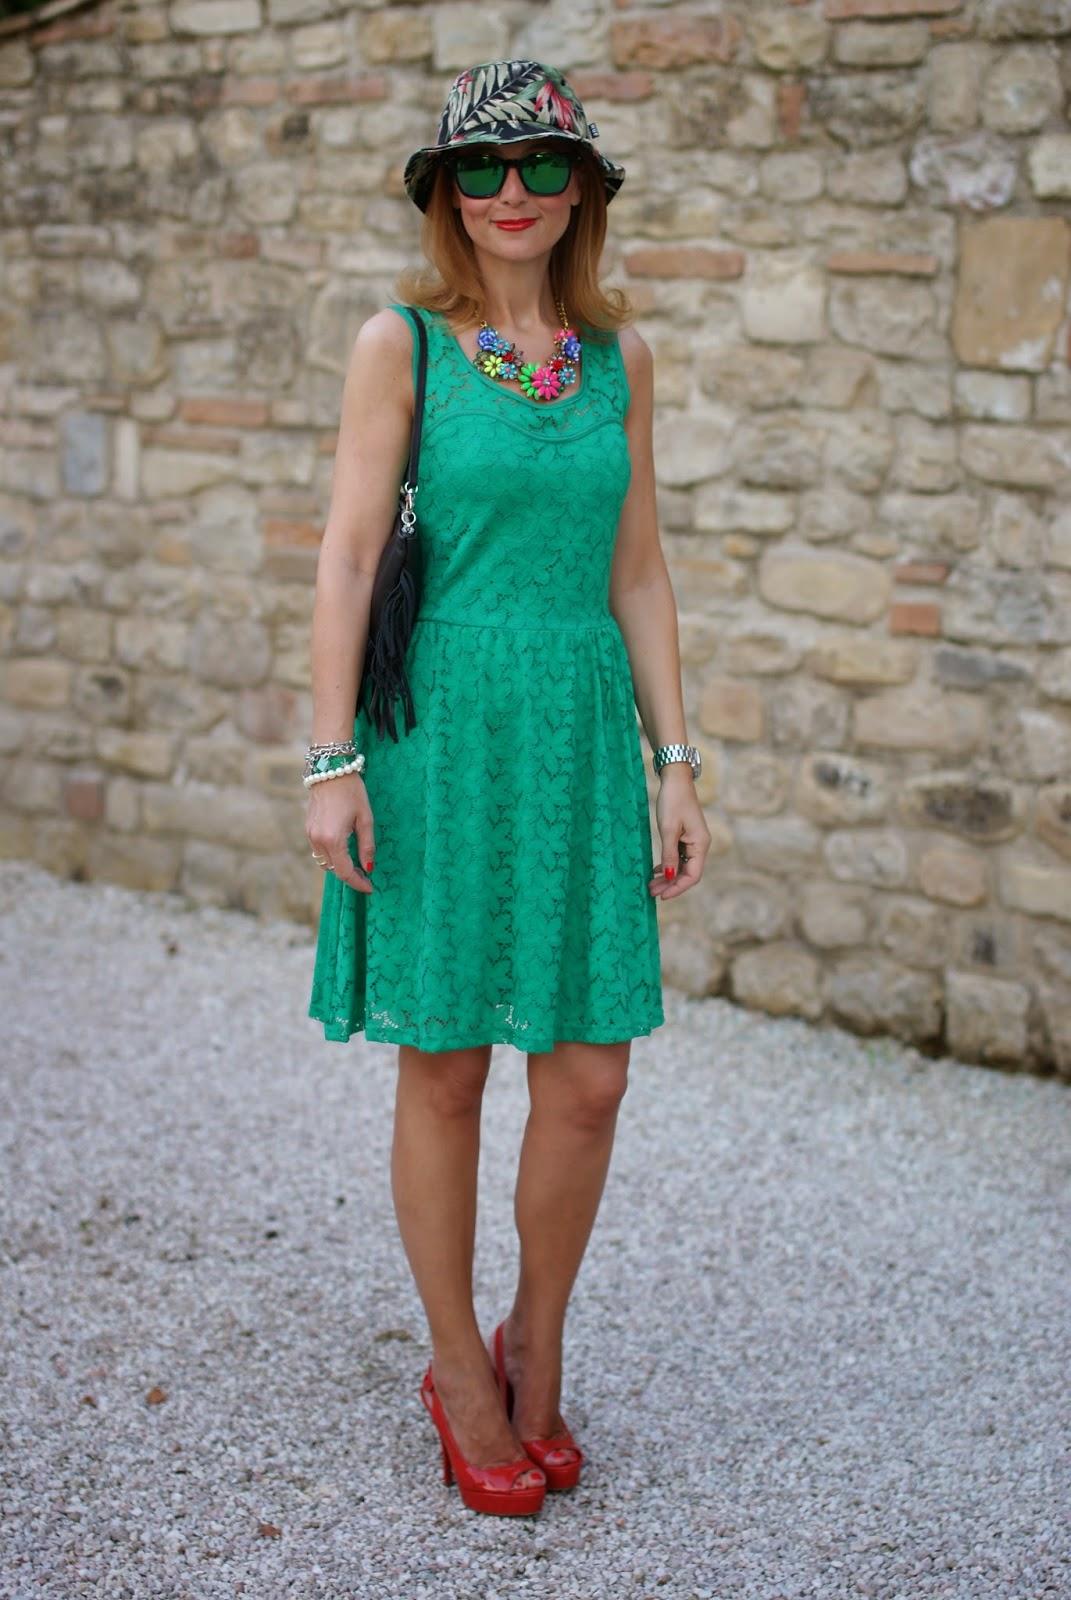 Morgan de toi lace dress, fringed bag, bob hat, oakley green sunglasses, Fashion and Cookies, fashion blogger